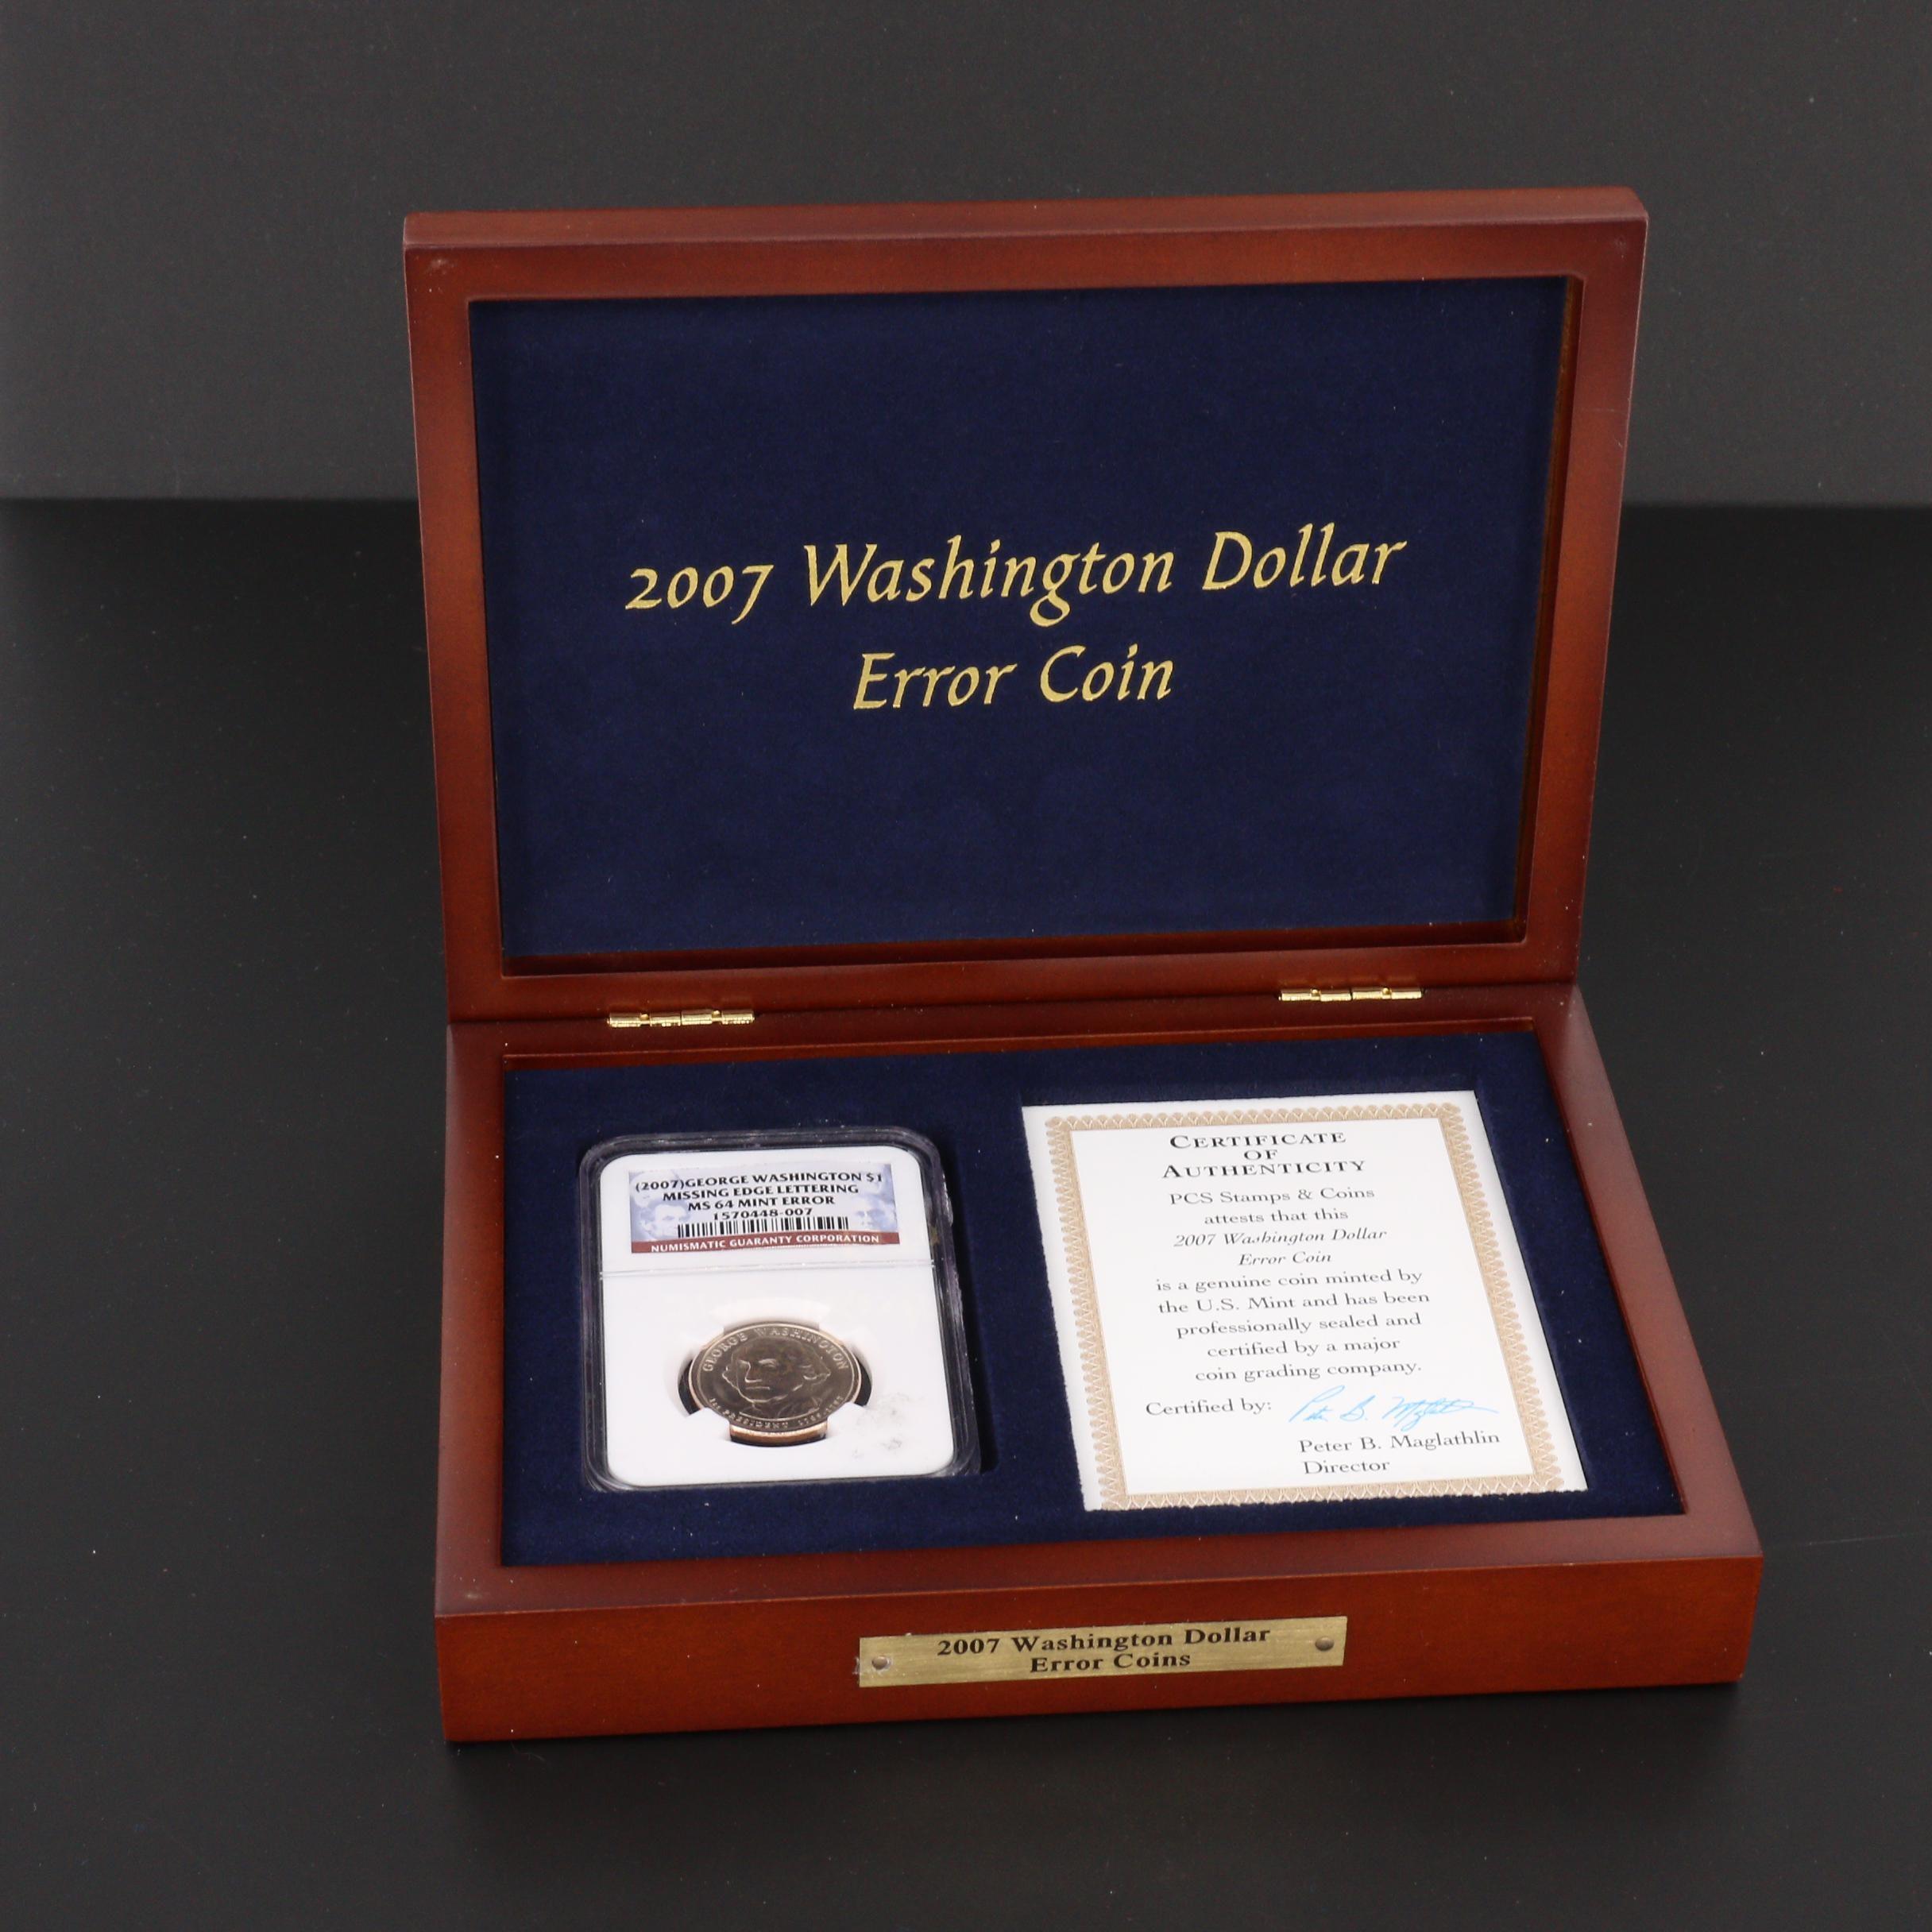 NGC Graded MS64 Mint Error 2007 George Washington $1 Coin